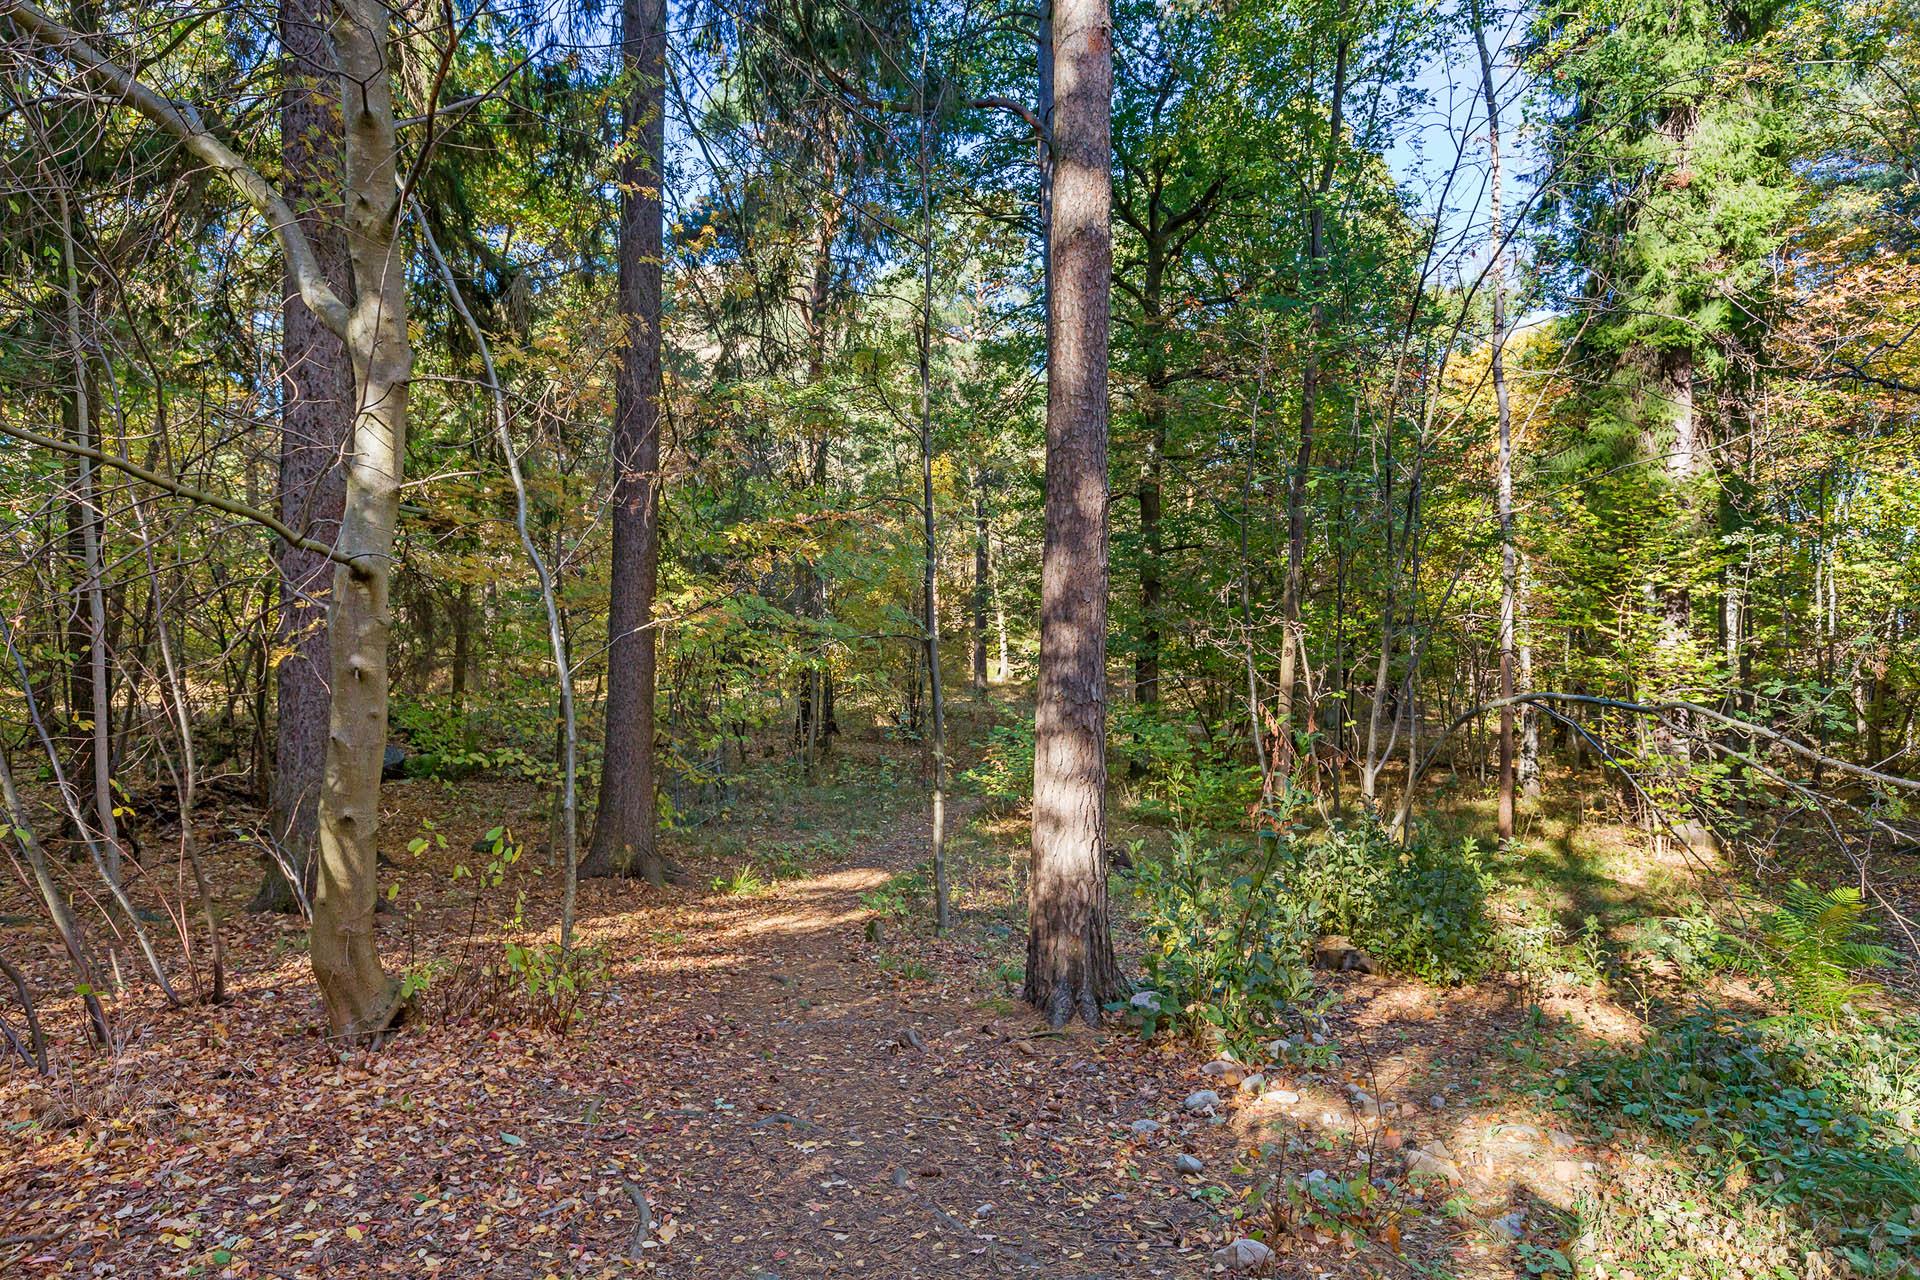 Lummig baksida med natursköna promenadstråk i Nackareservatet.